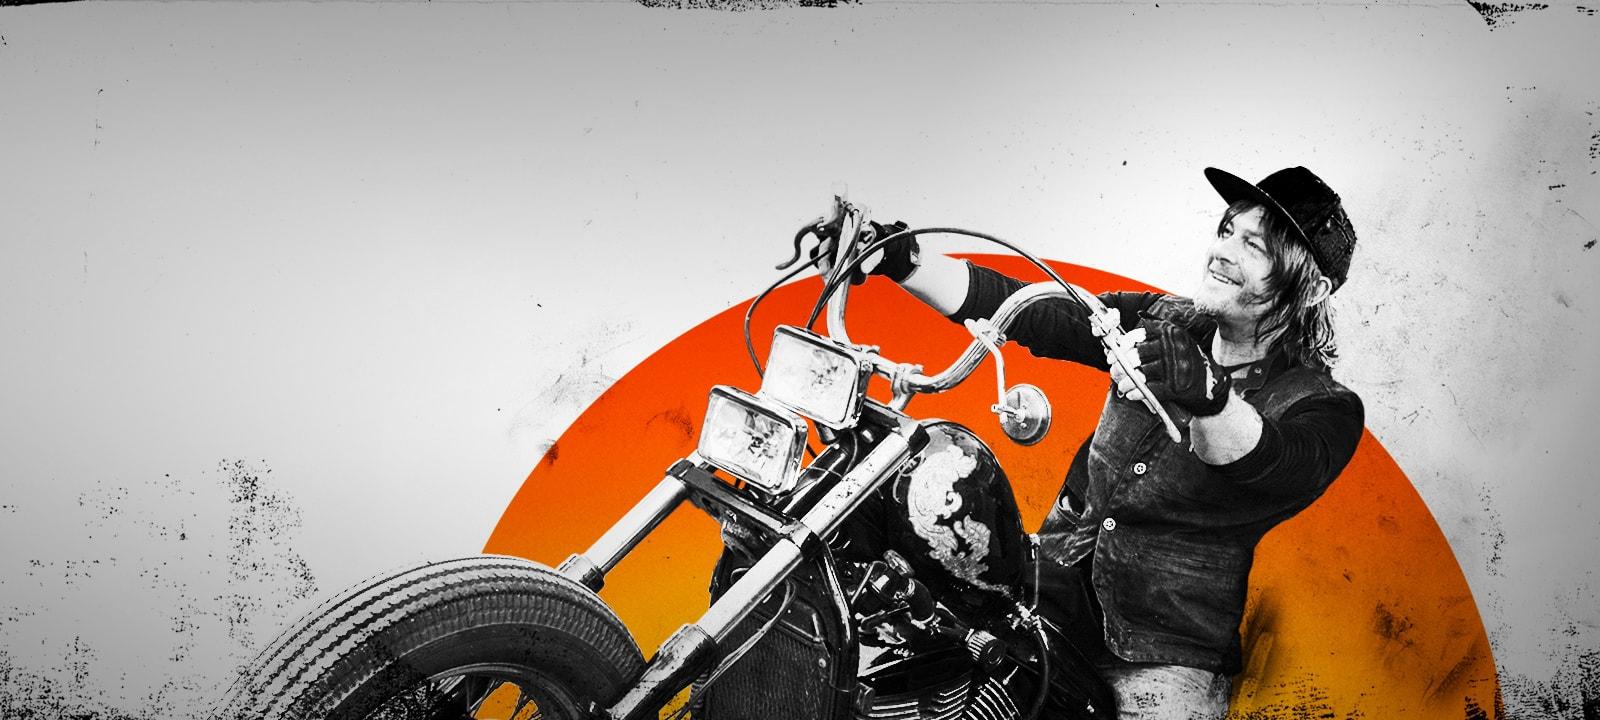 ride-with-norman-reedus-S3-season-3-key-art-revised-800x600_MobileWeb_HomeHeroREV